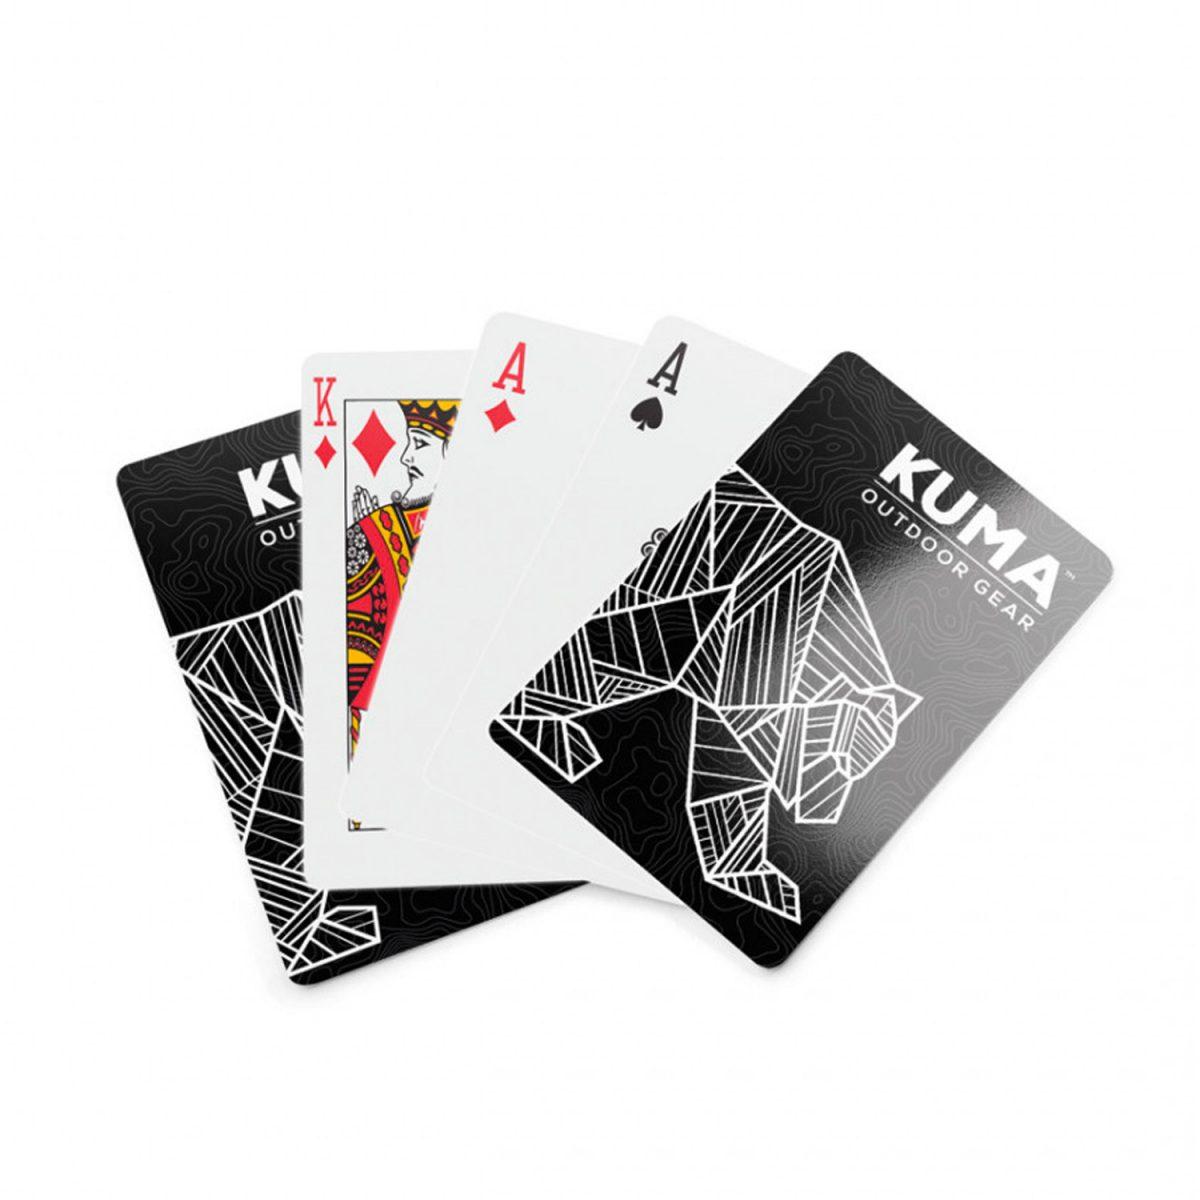 kuma playing cards studio